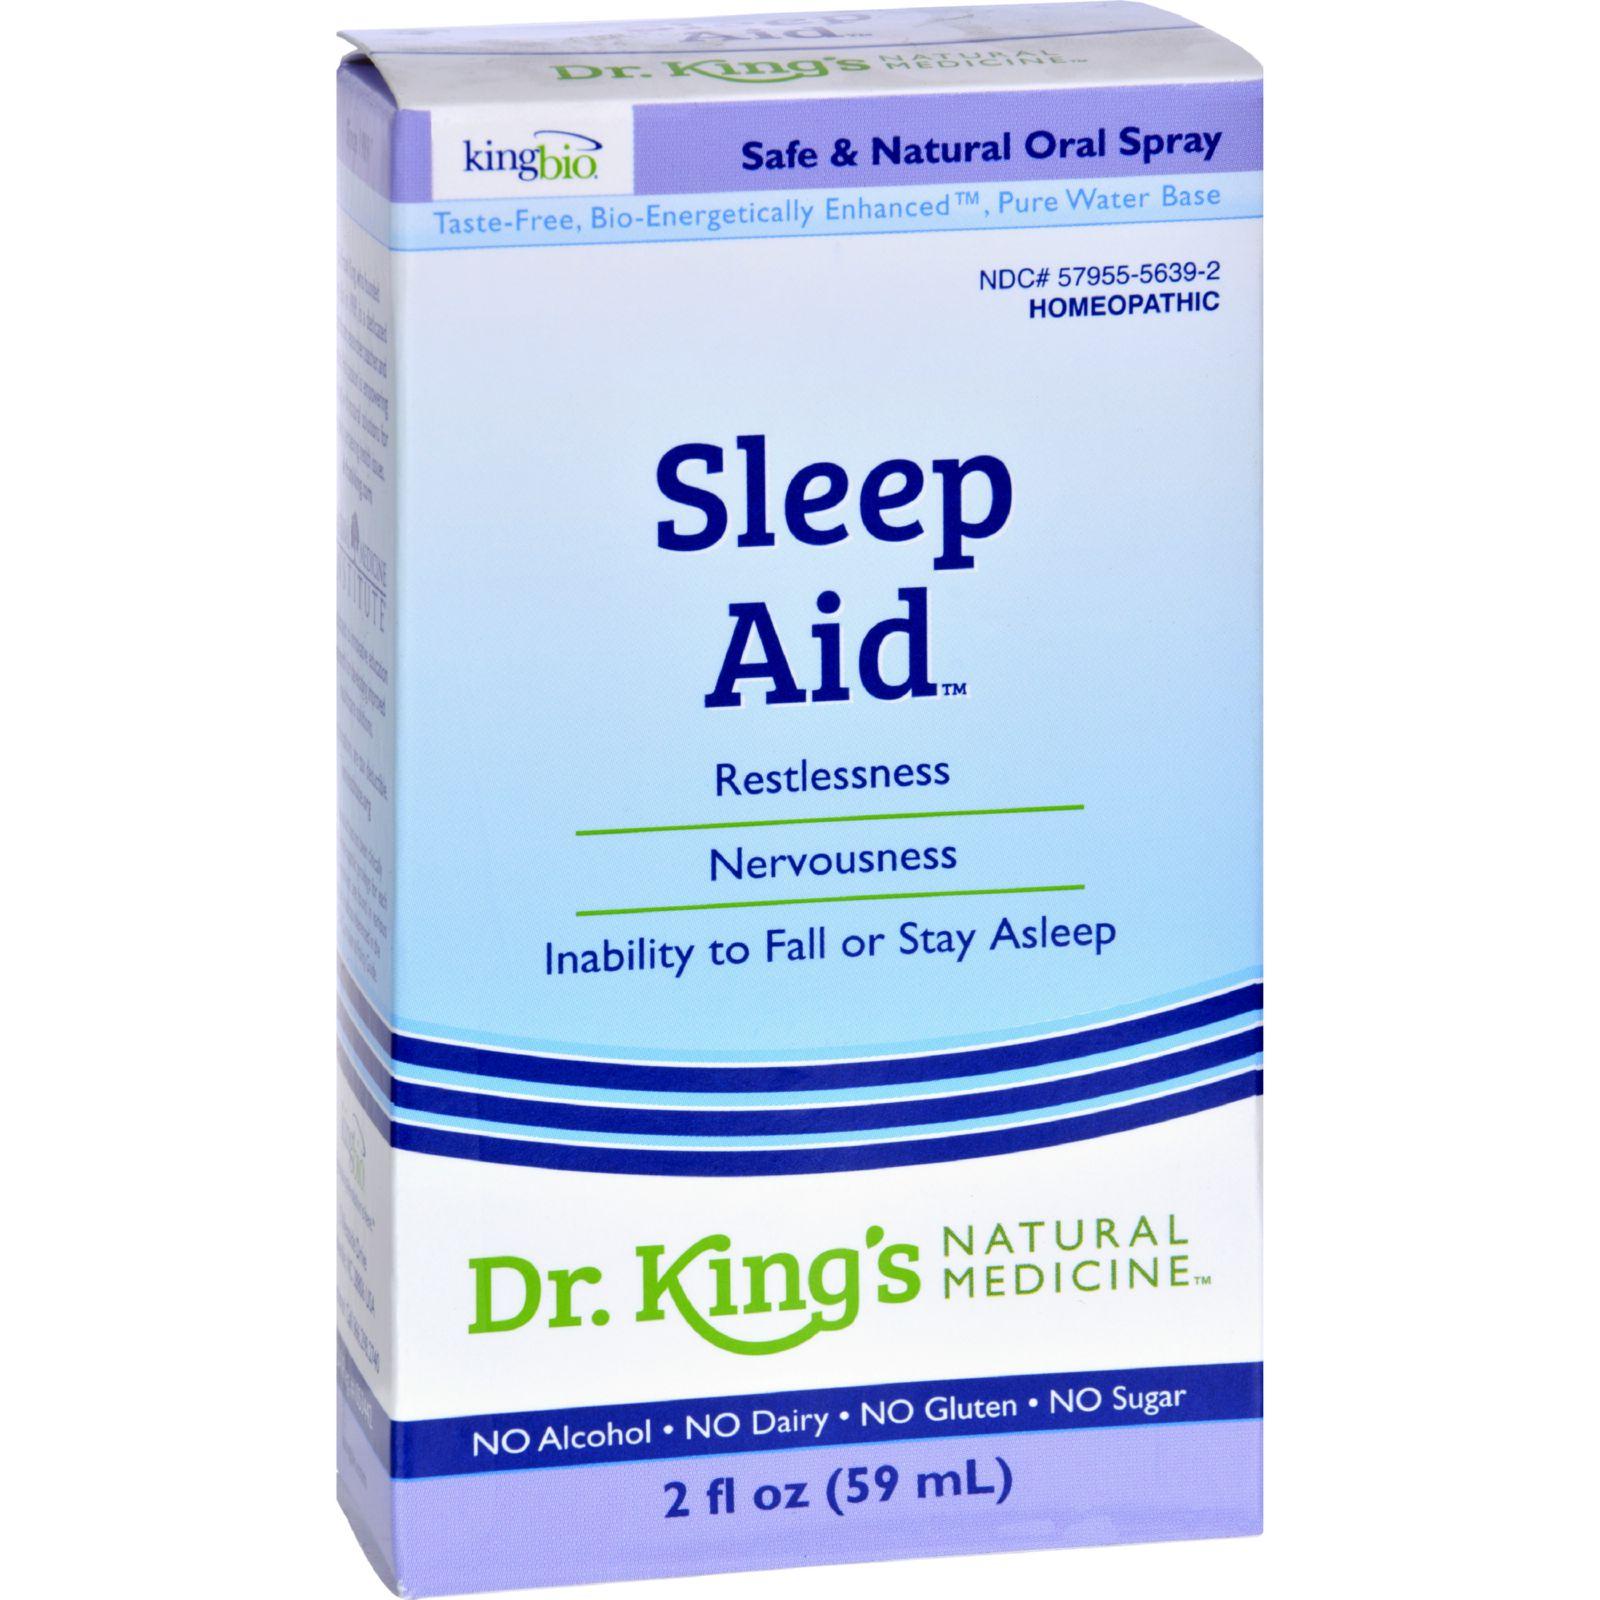 King Bio Homeopathic Sleep Aid - 2 Fl Oz